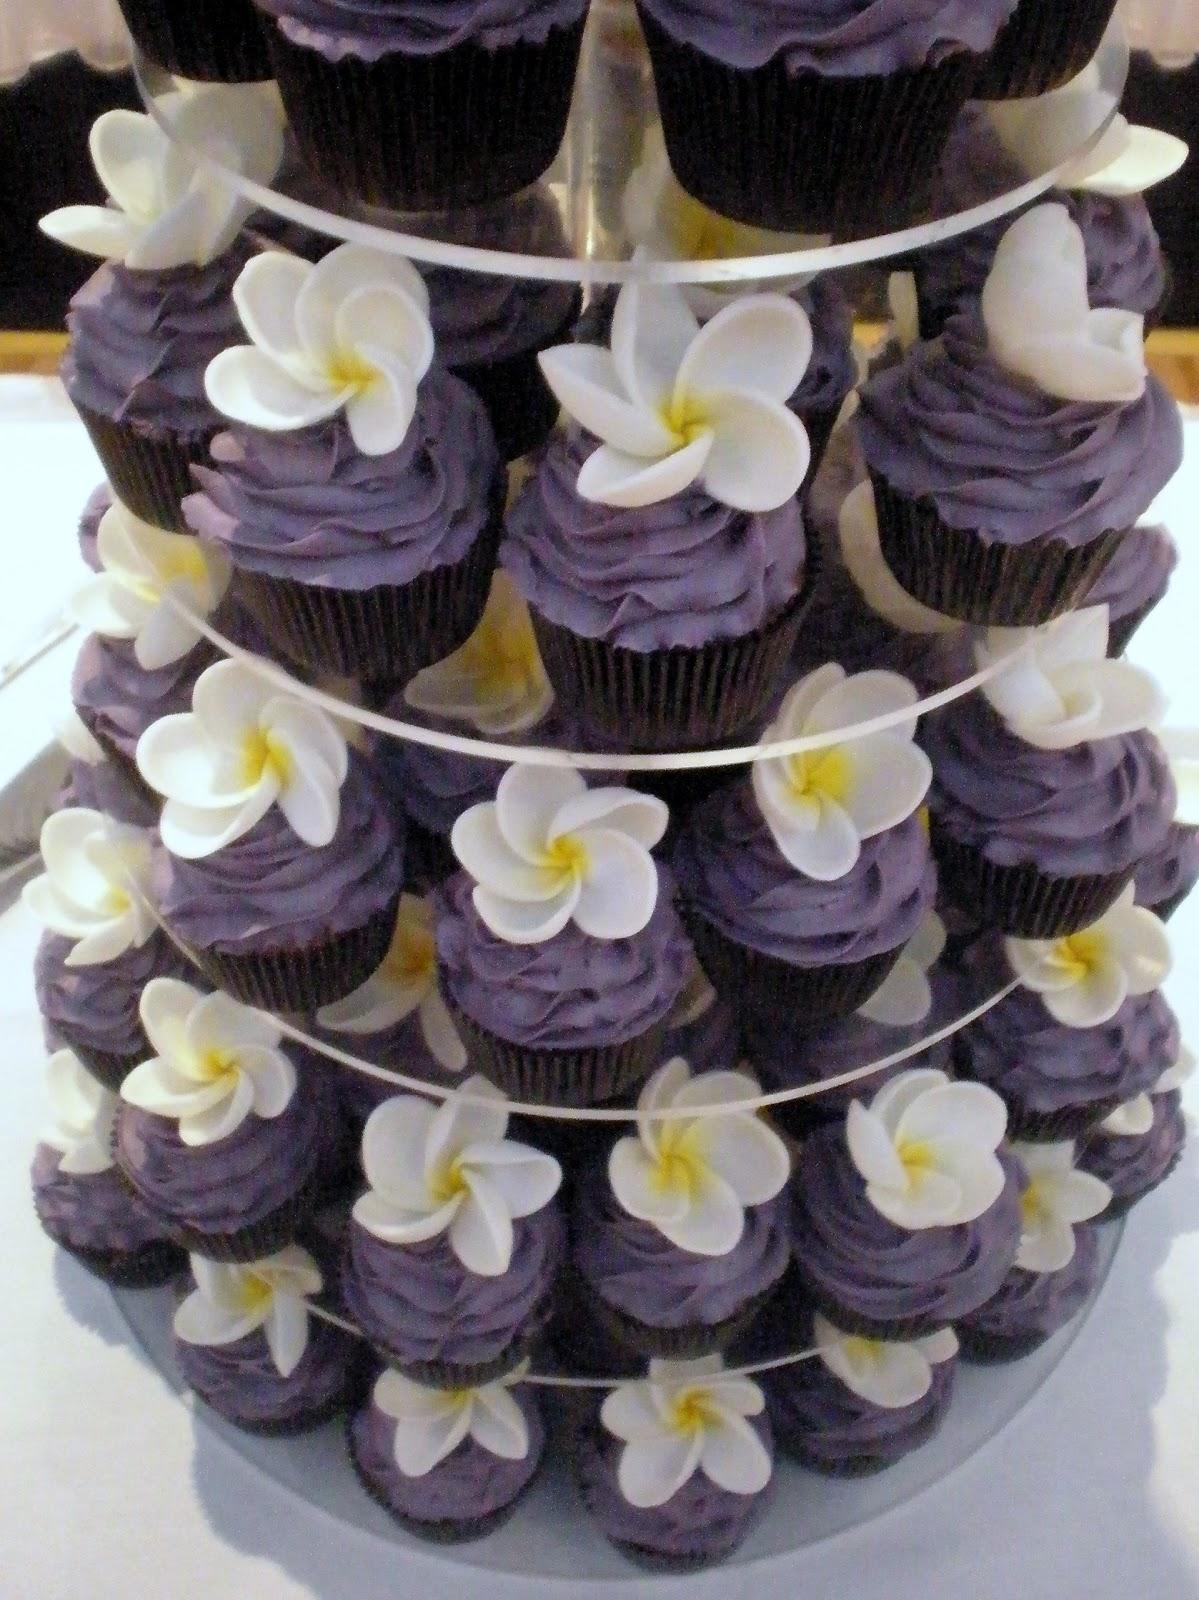 http://3.bp.blogspot.com/_EqK-9DCEgJY/TO99SjKbq1I/AAAAAAAAqy0/8qFN7K-bqOo/s1600/Cupcakes%2B-%2BWedding%2BFrangipani2%2B05.jpg